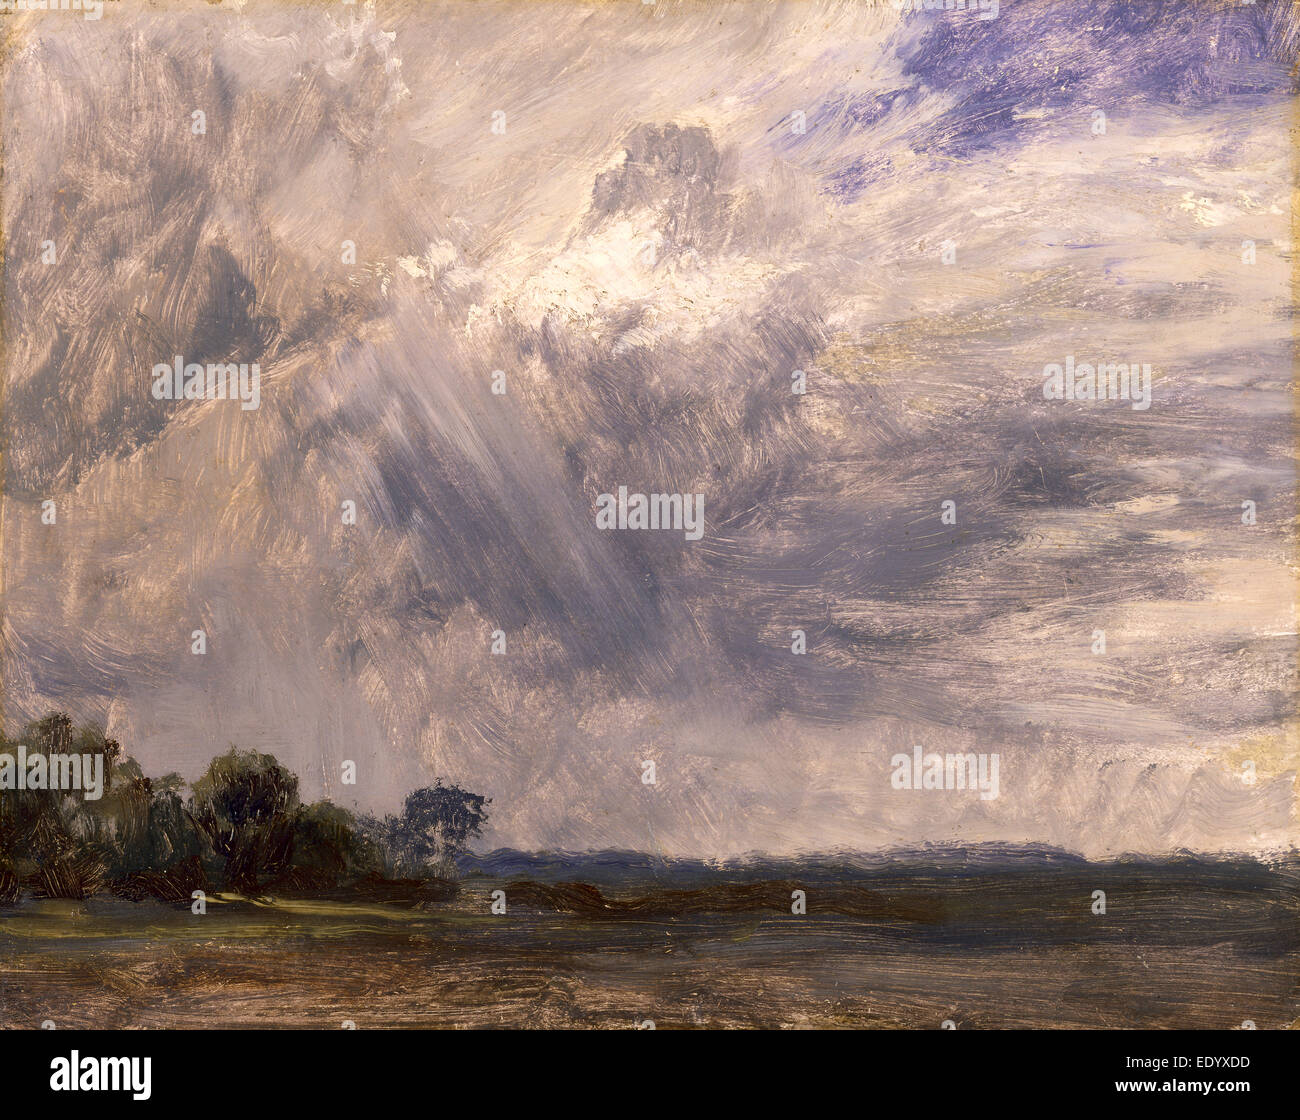 John Constable on Curiator